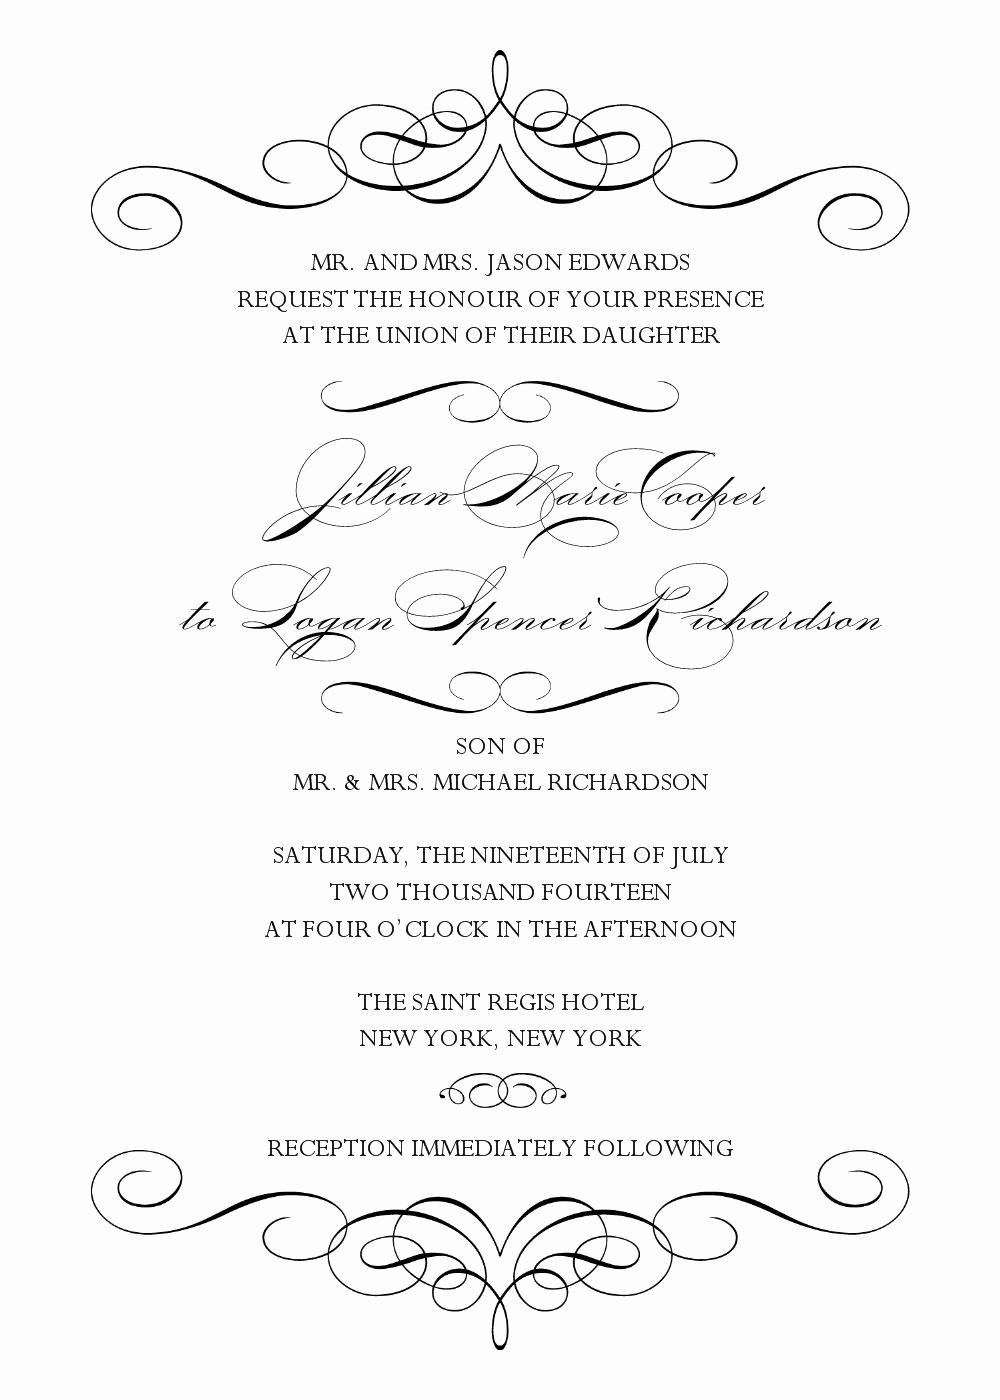 Wedding Invitations Templates Word Free Beautiful Wedding Invitation Wedding Invitation Templates Word